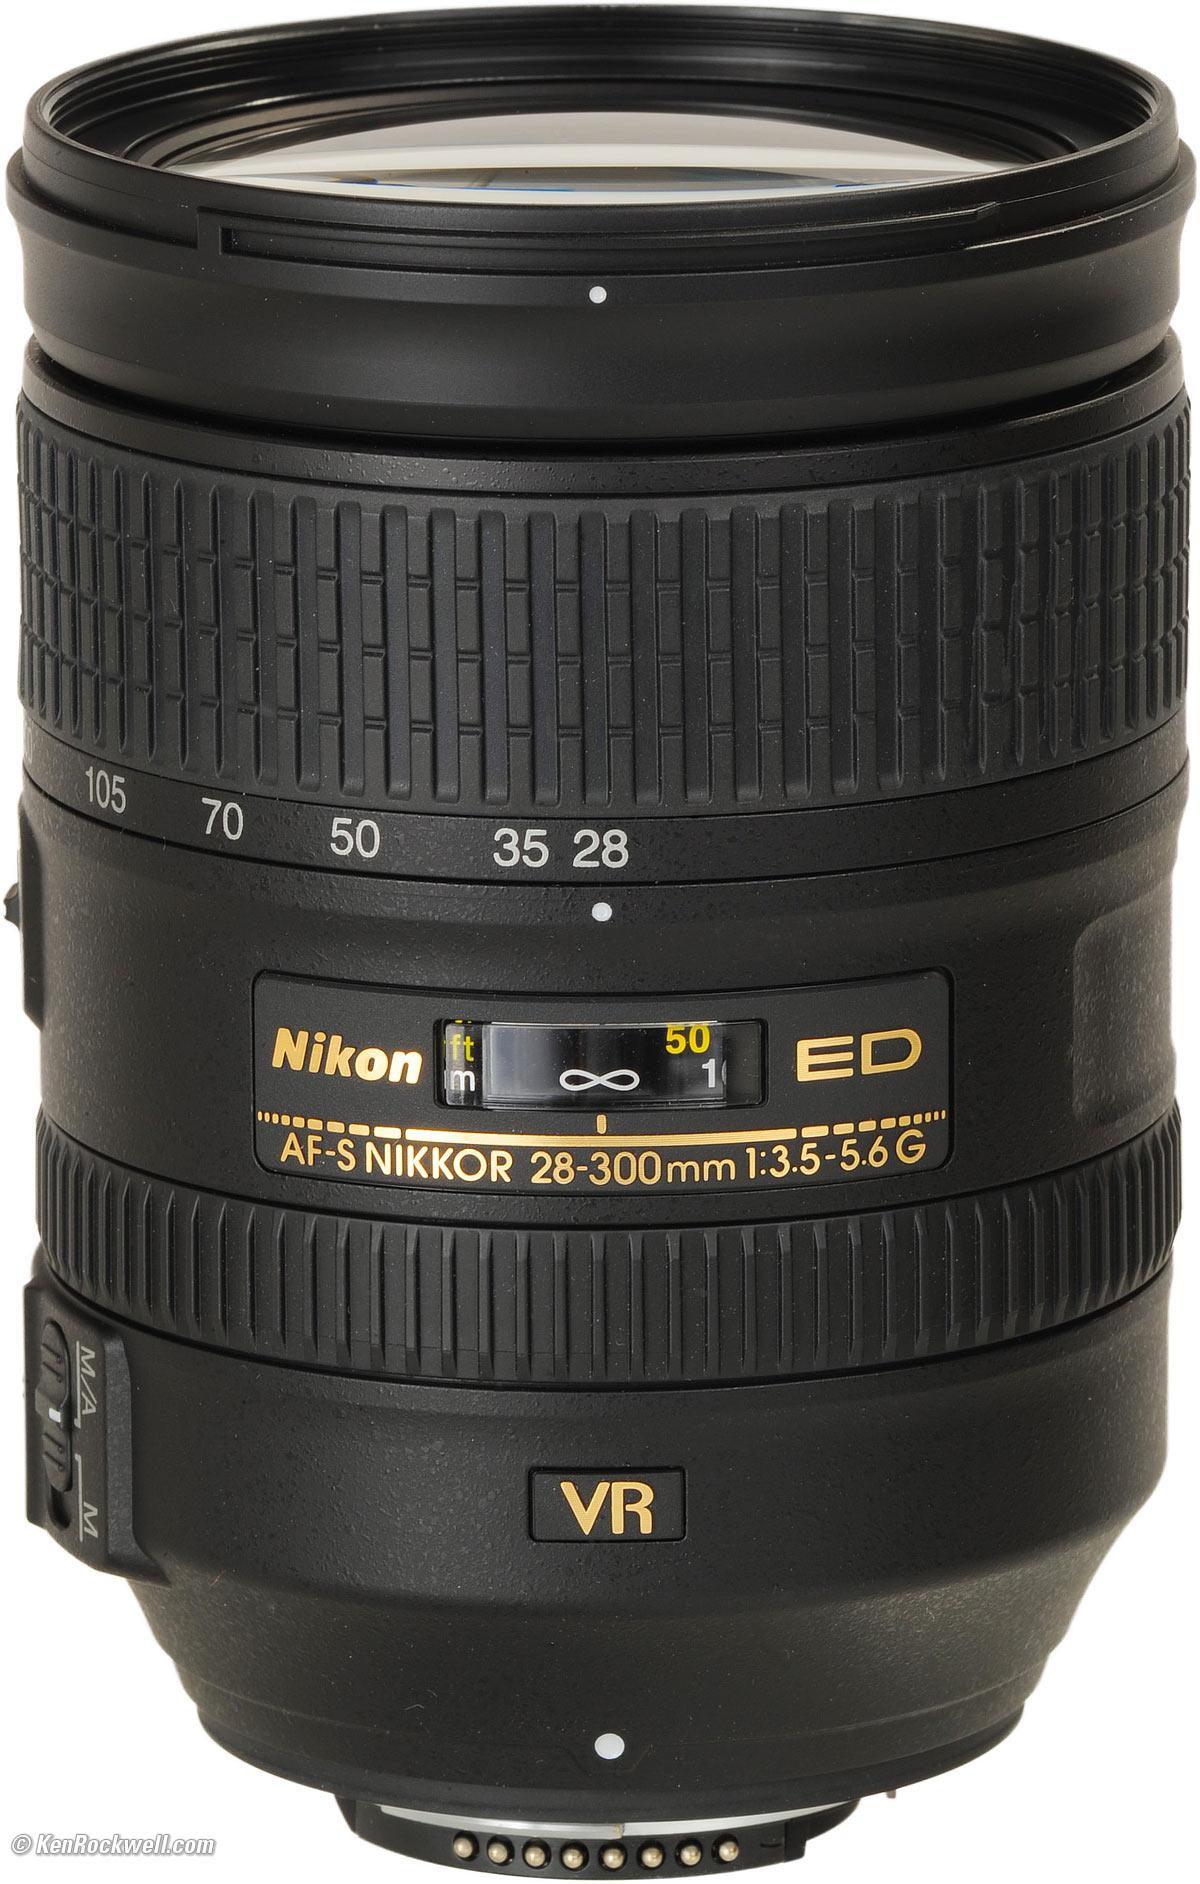 Splendid I Got Mine At Nikon Vr Review 300mm To Inches 300mm To Inches Fraction dpreview 300mm To In